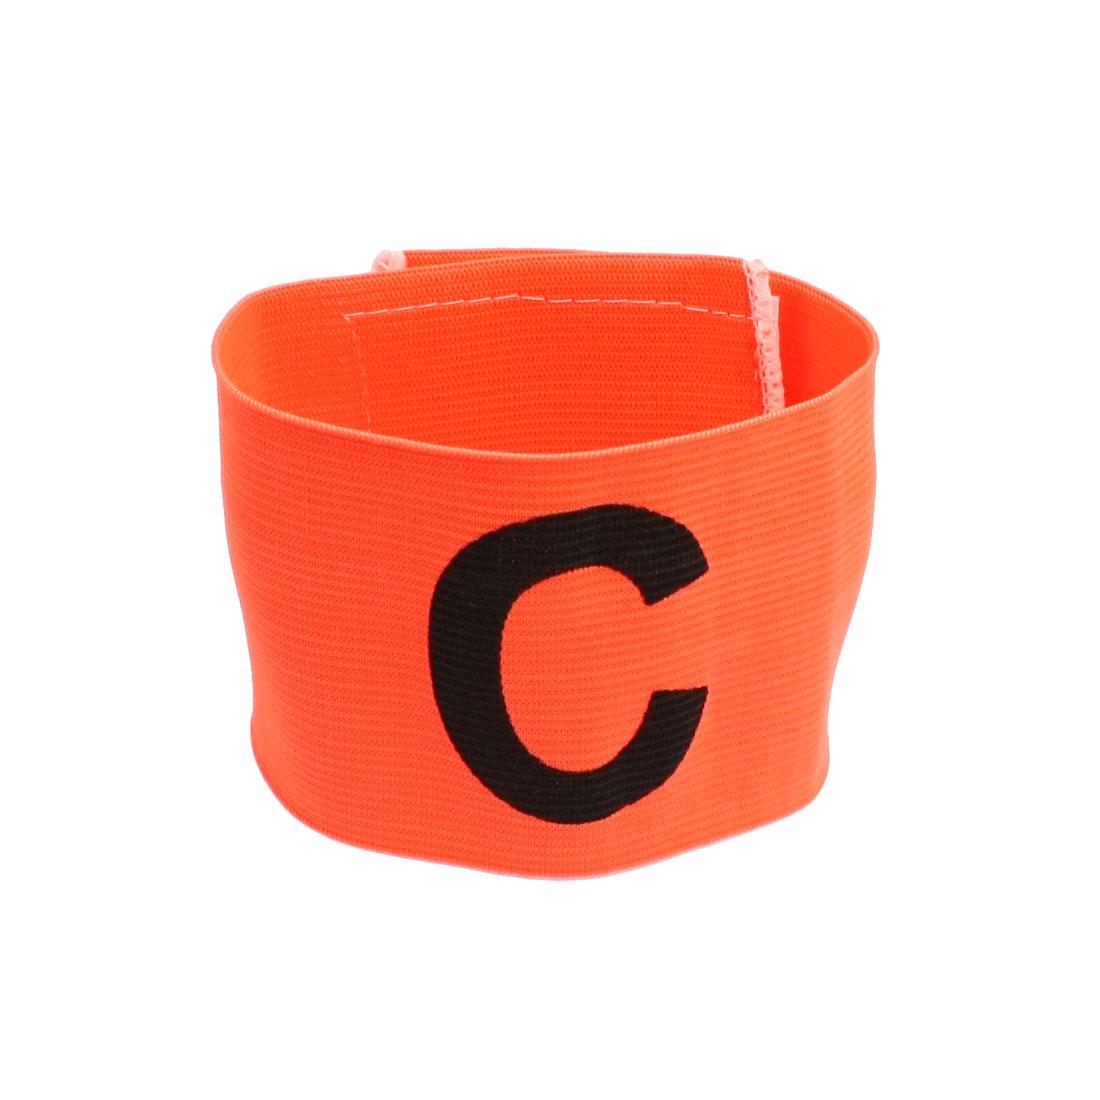 Orange Nylon Hook Loop Fastener C Pattern Badge Band Team Armband